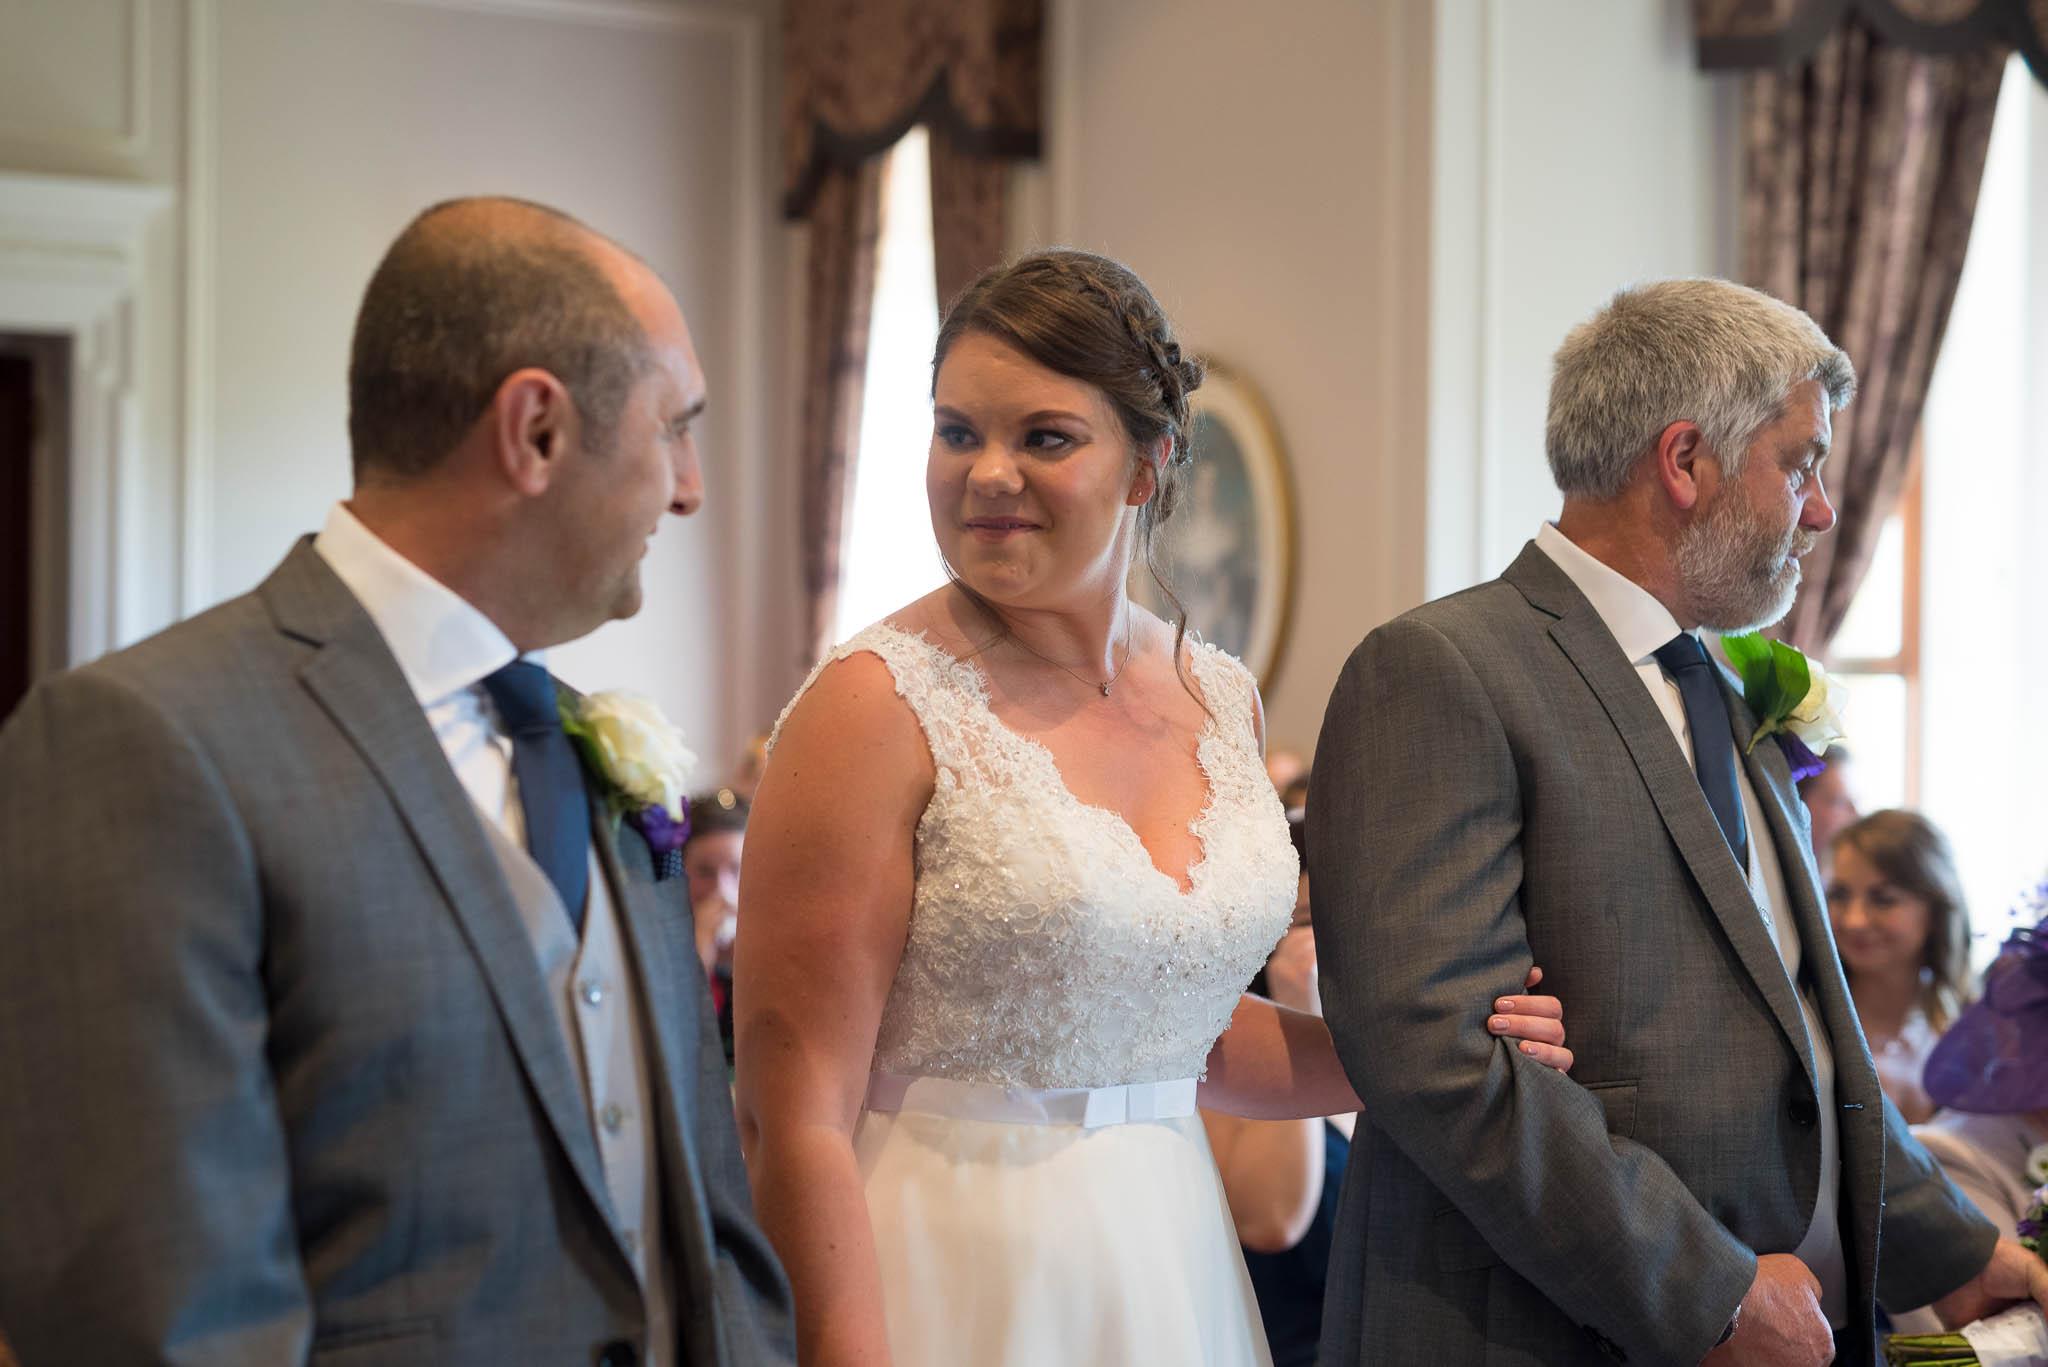 Crathorne Hall Hotel Wedding Photographer54.jpg